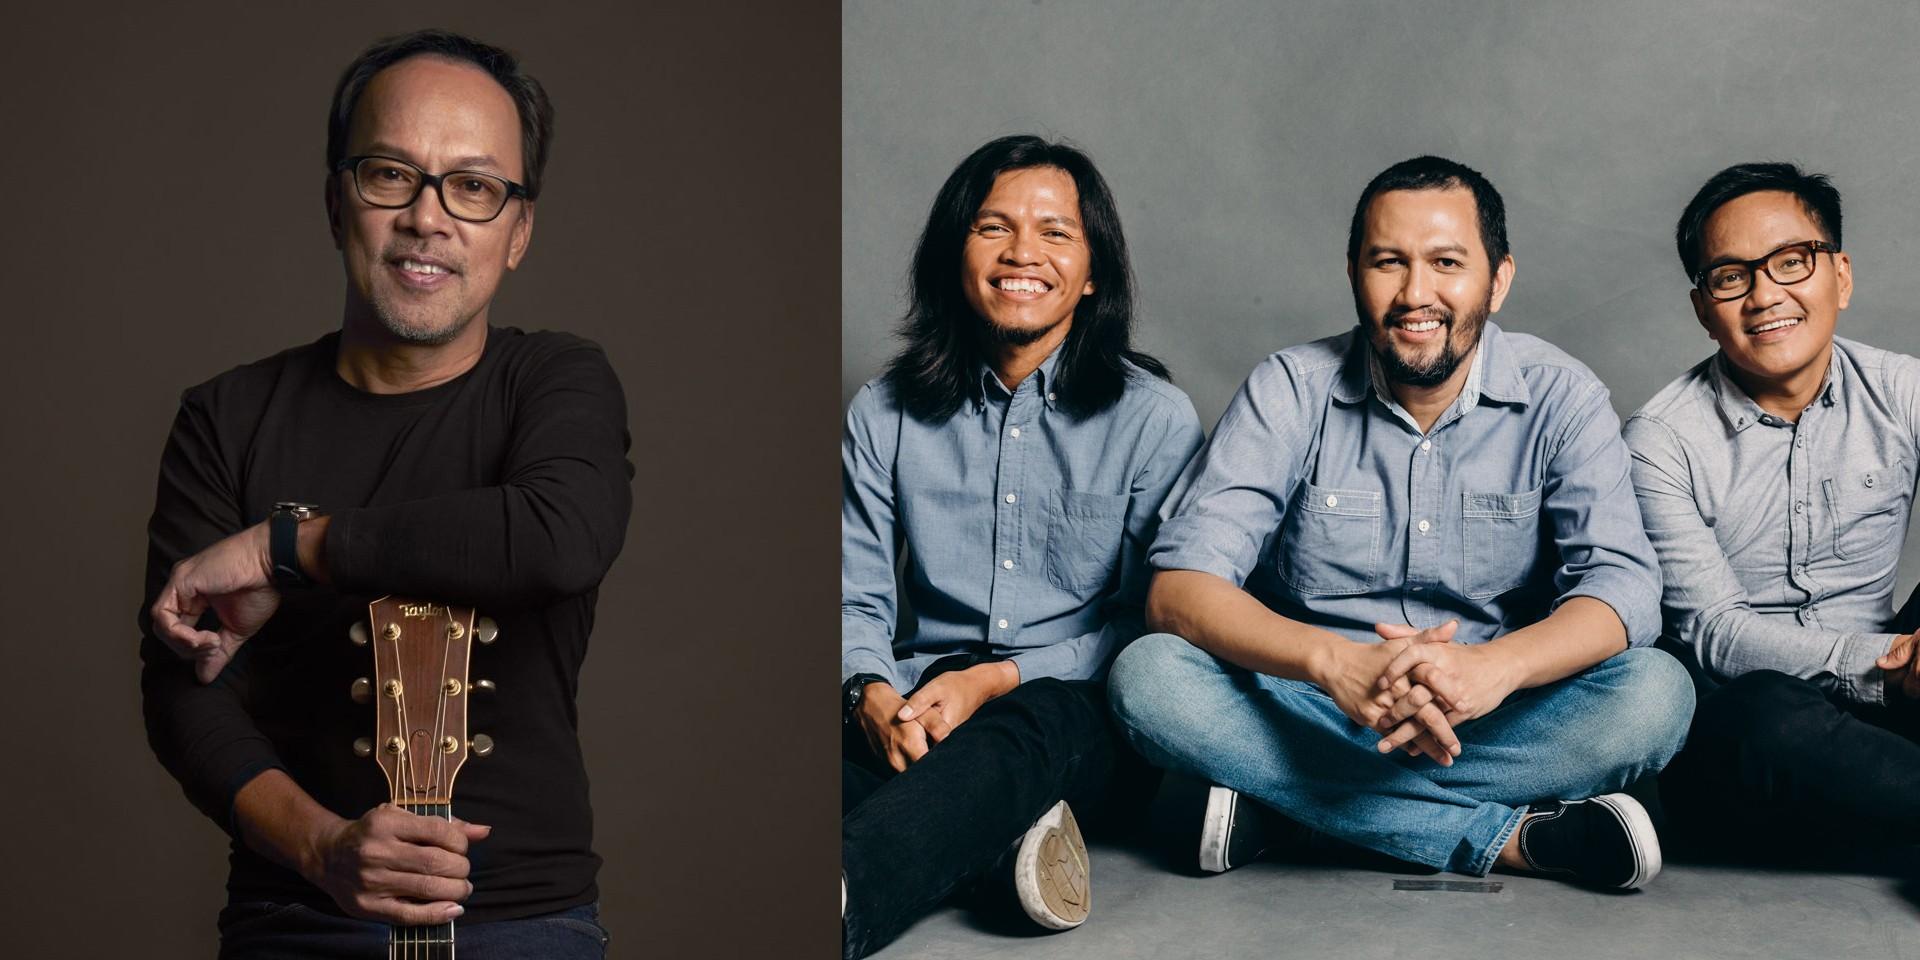 Noel Cabangon teams up with Johnoy Danao, Bullet Dumas, and Ebe Dancel for new collab 'Gagaan Din Ang Buhay' – listen